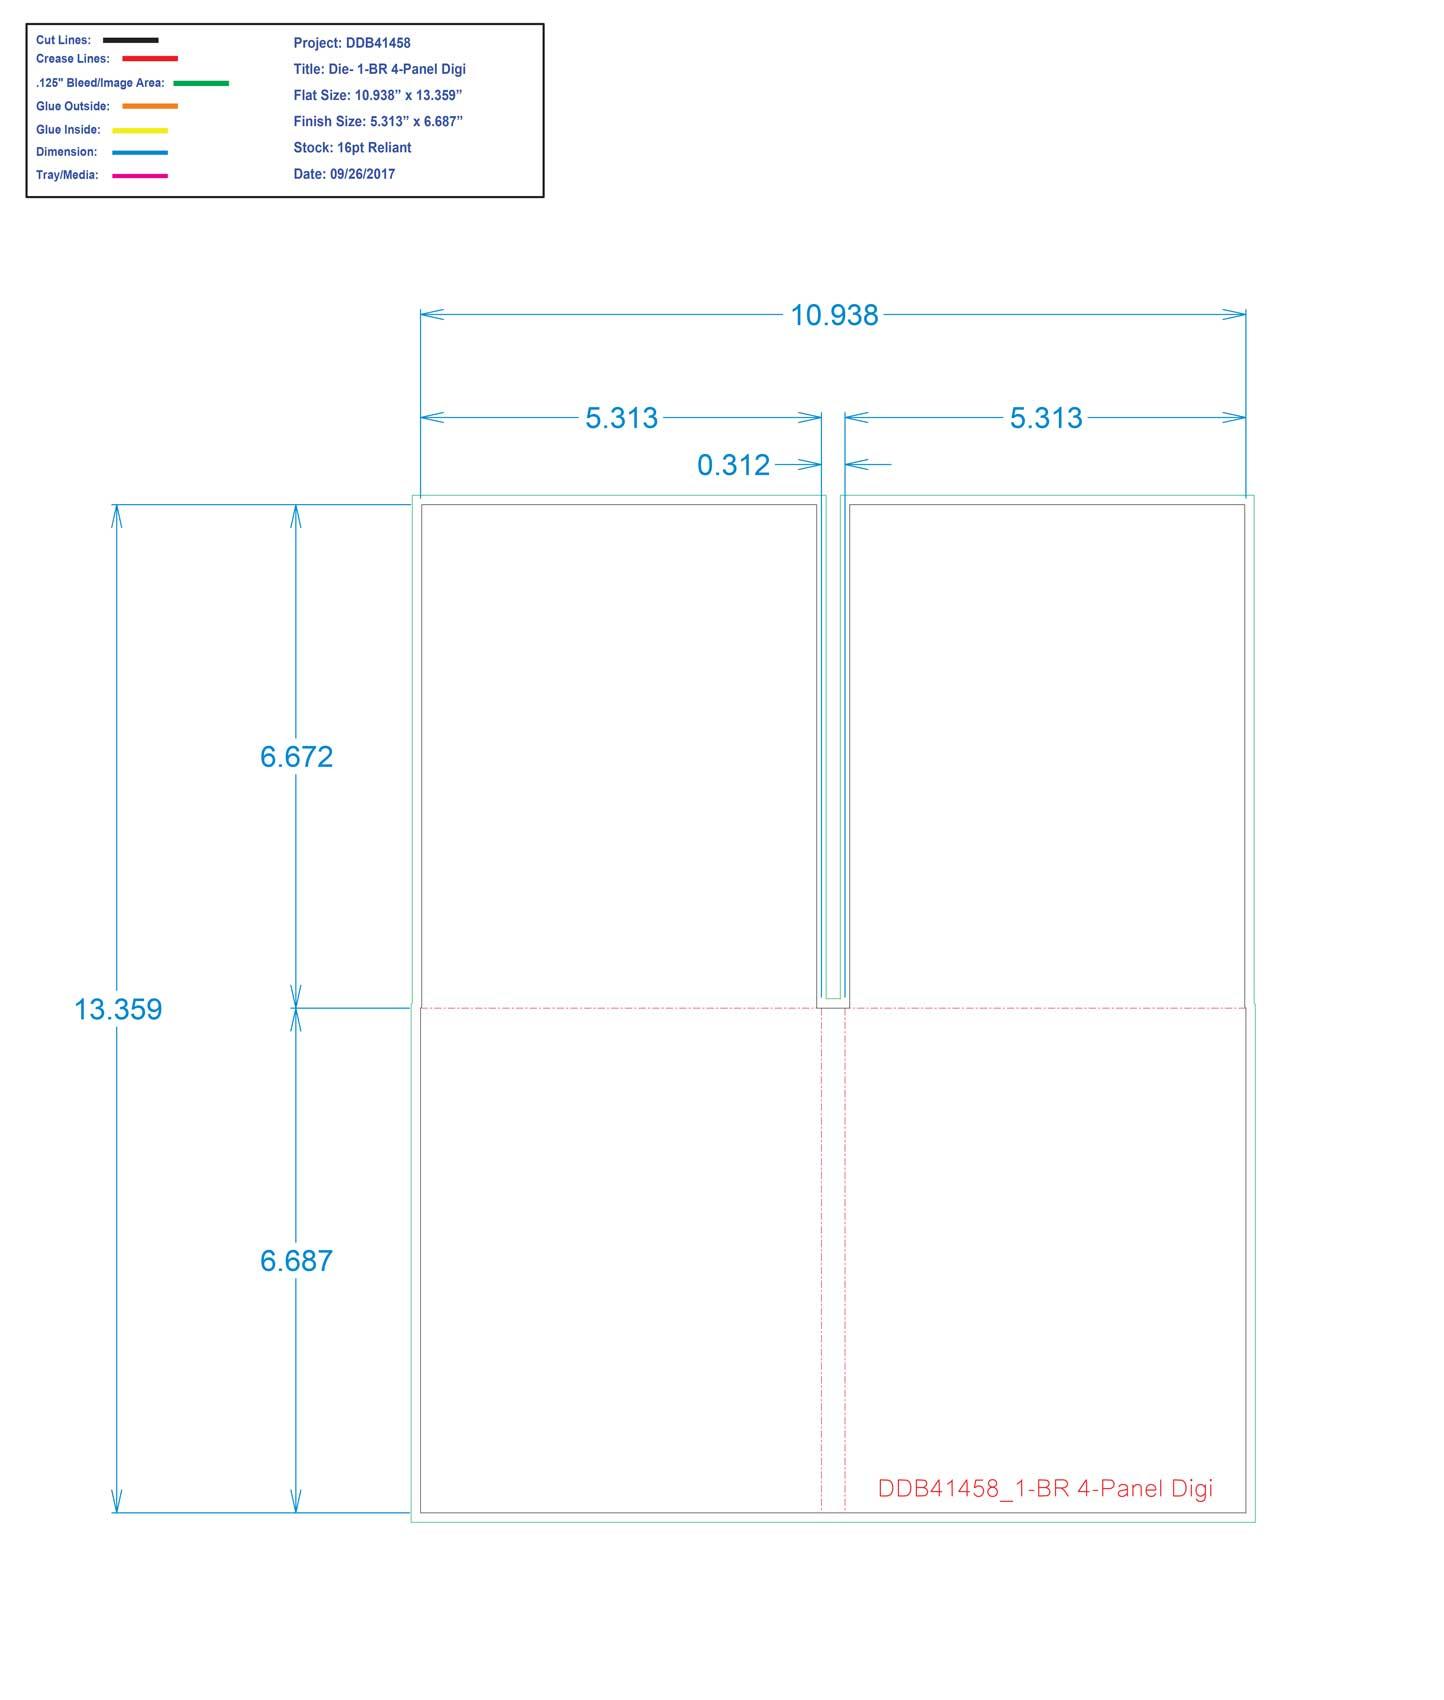 DDB41458 - 1-BR 4-Panel Digi